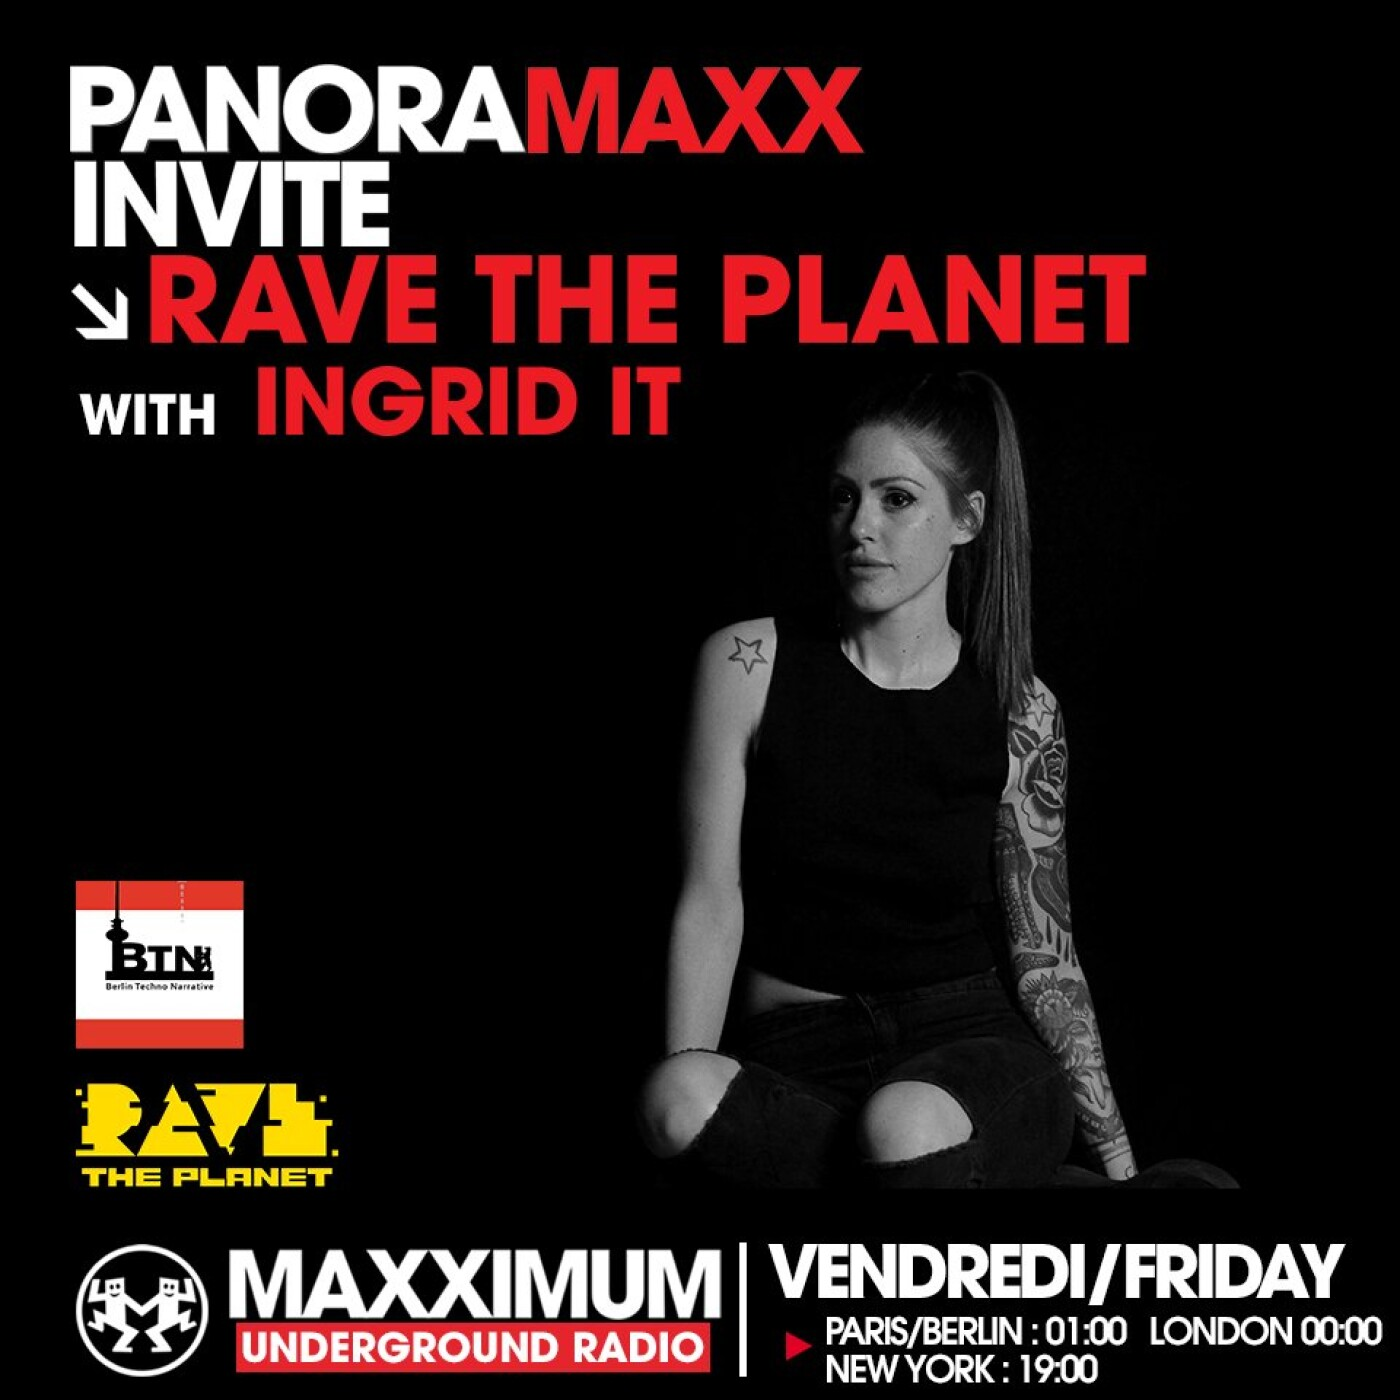 PANORAMAXX : INGRID IT